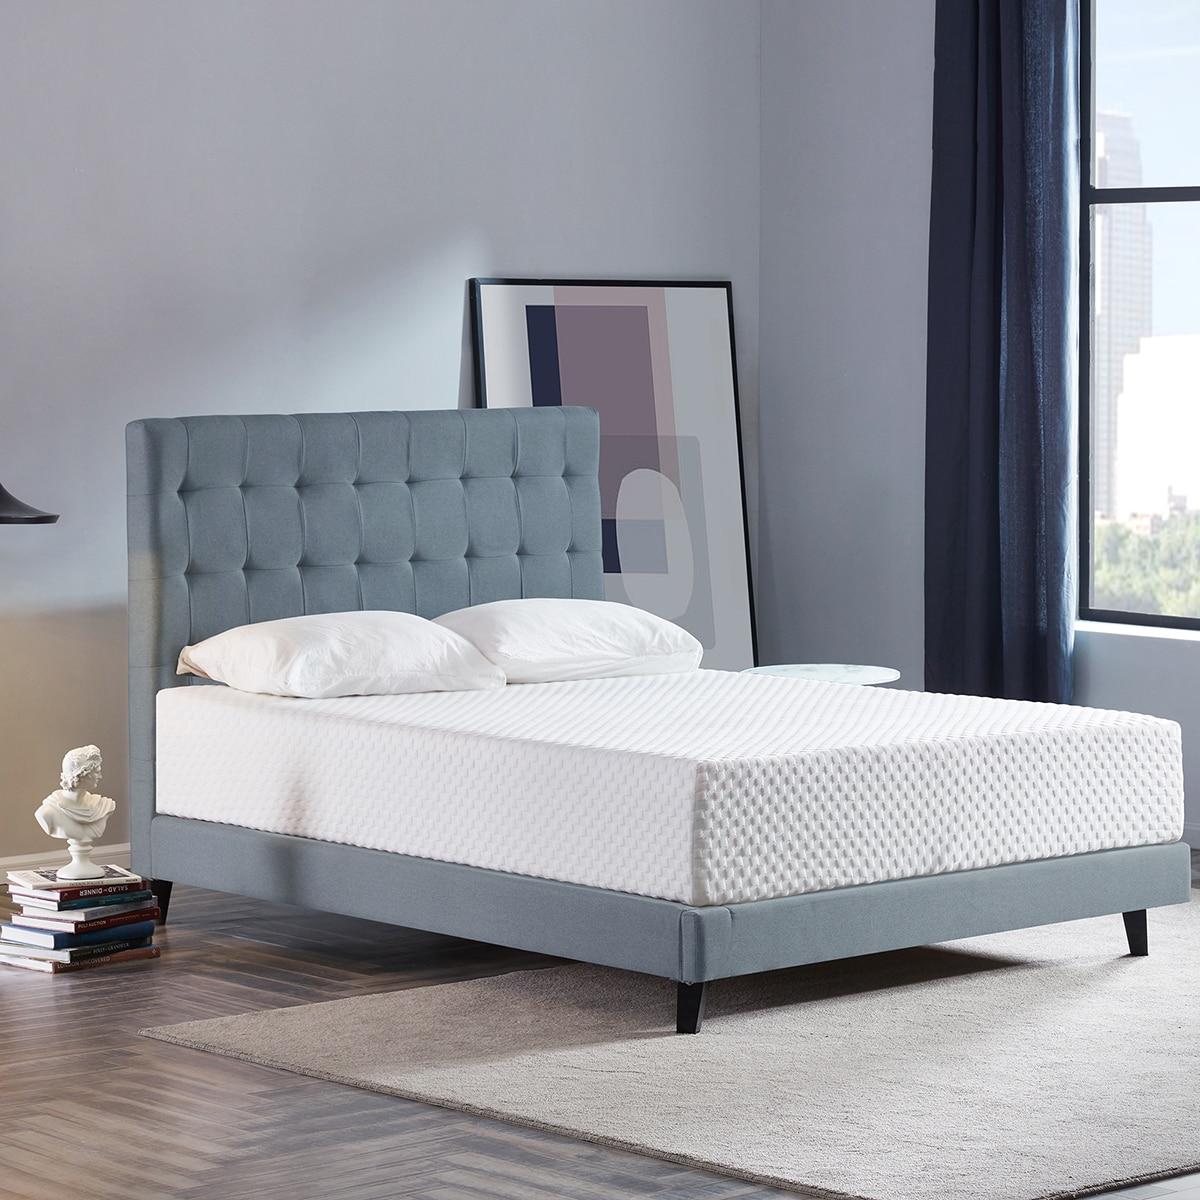 High Density 3 Layers 12 Inch Soft Breathable Memory Foam Mattress